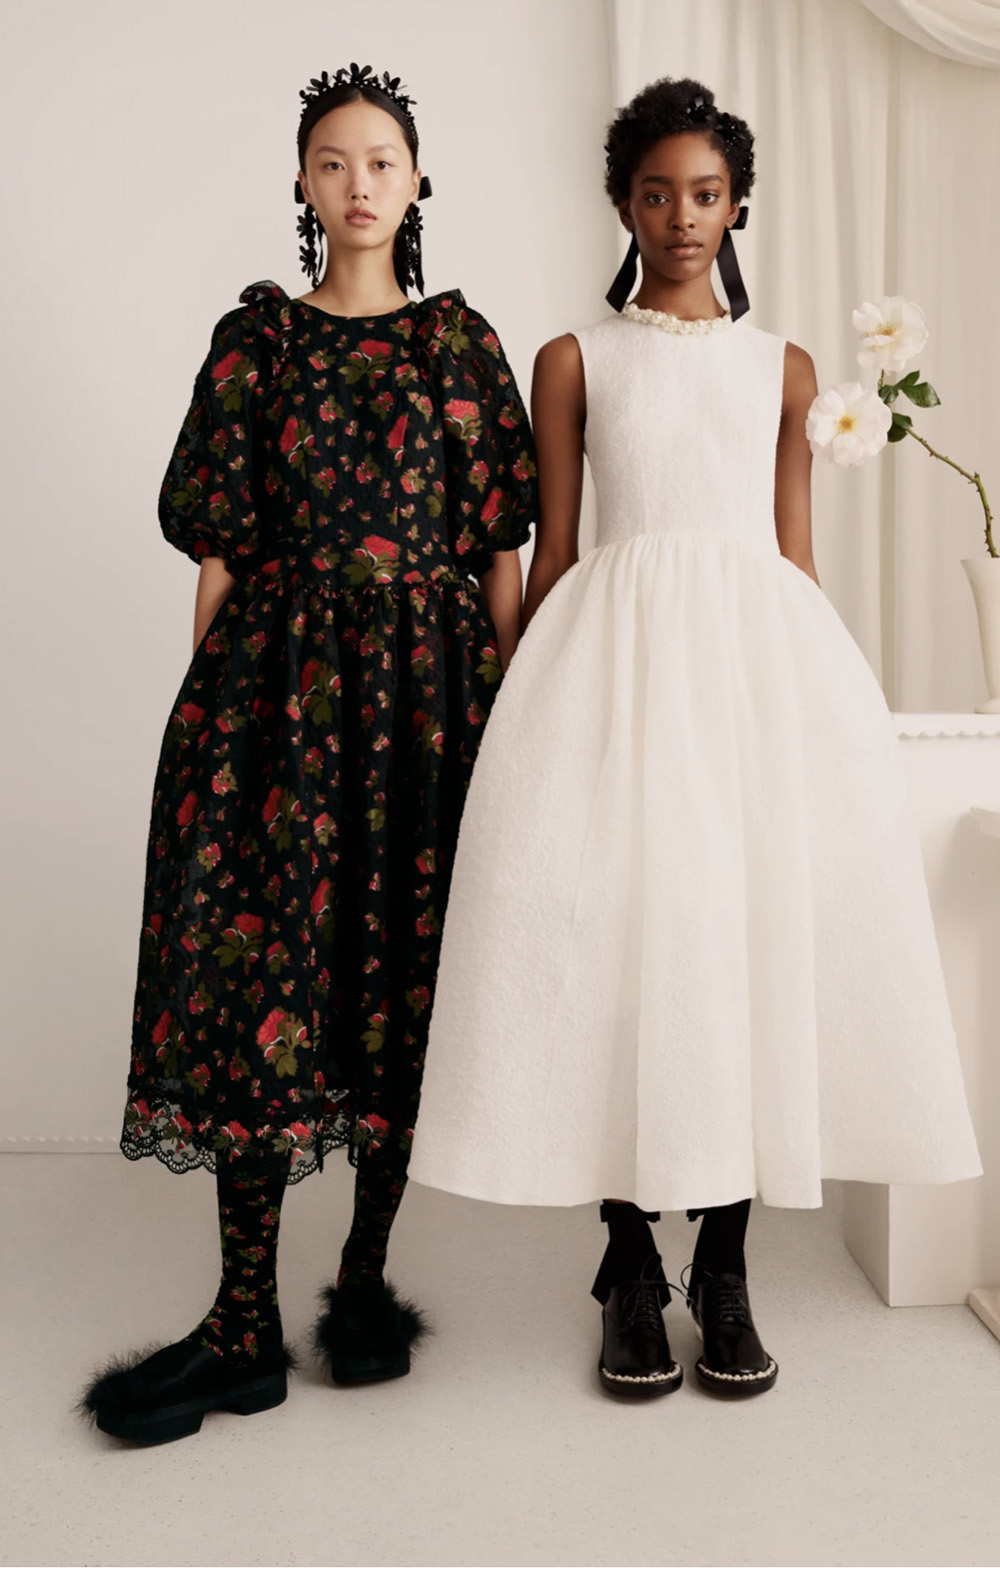 HM Simone Rocha Collection for Spring 2021 I DreaminLace.com #womensfashion #fashionstyle #simonerocha #springoutfits